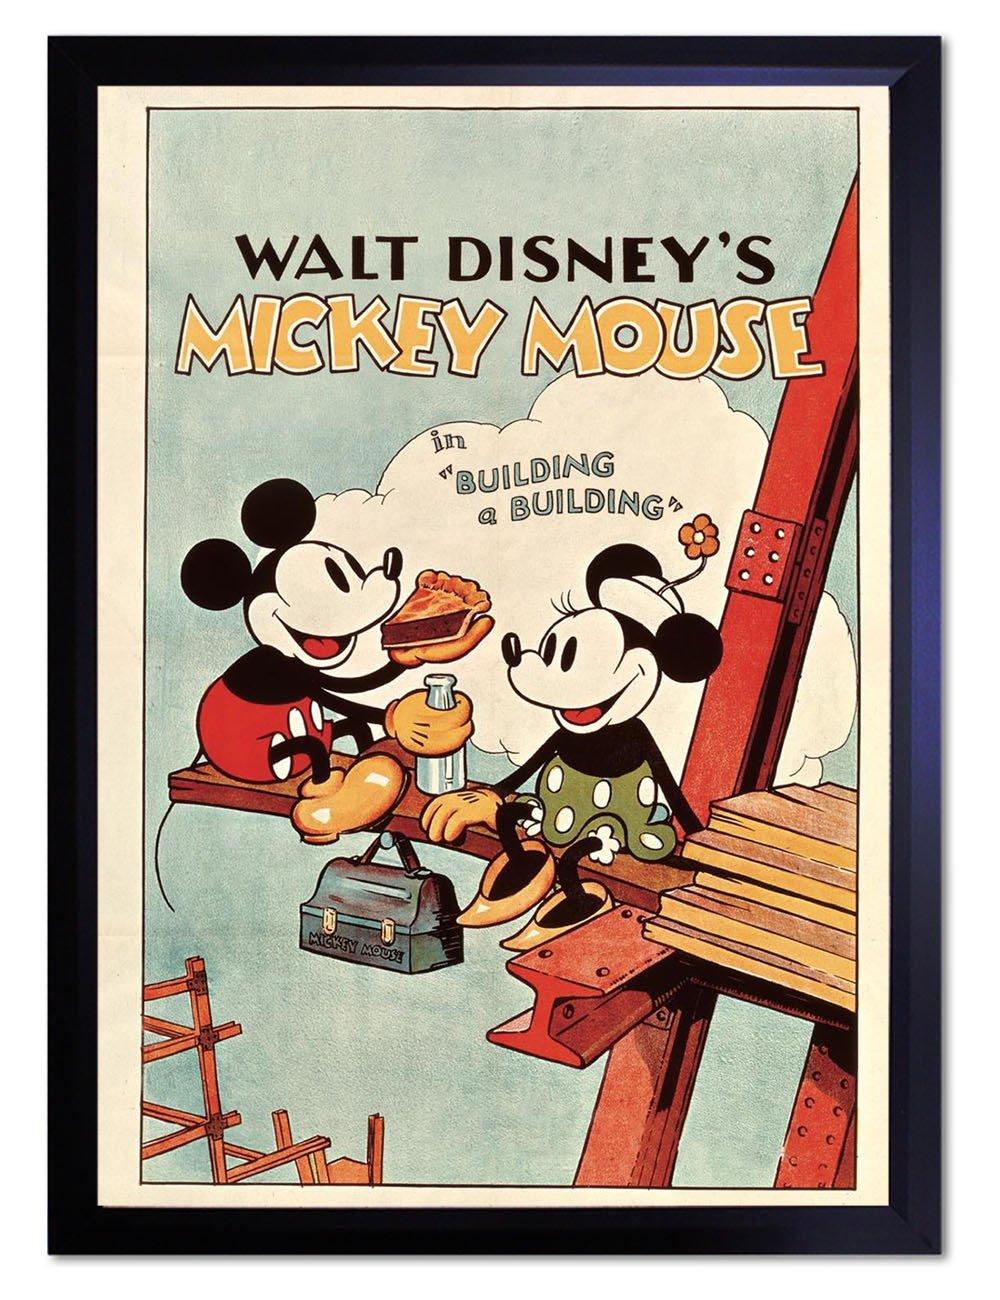 【DXポスター】ディズニーポスター Disney ミニーマウス レトロP-A3-POP-DSNY-0030-bk P-A3-POP-DSNY-0030-bk B073SG444JA3サイズ(42cm×29.7cm)+ブラックフレーム